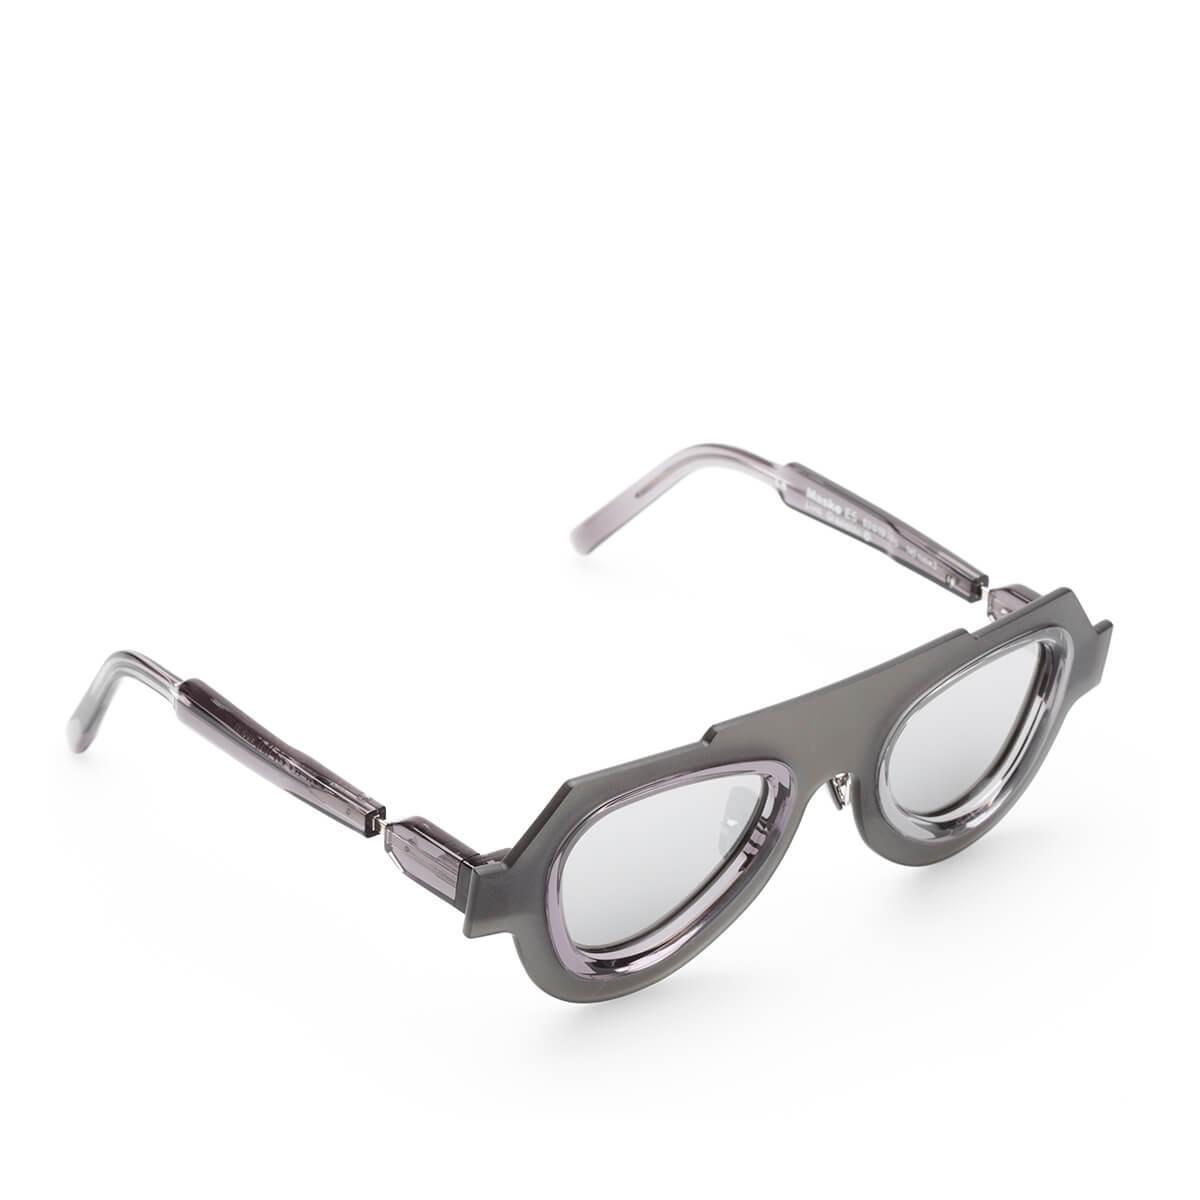 8c2644add6 Lyst - Kuboraum E5 Fs Sunglasses in Black for Men